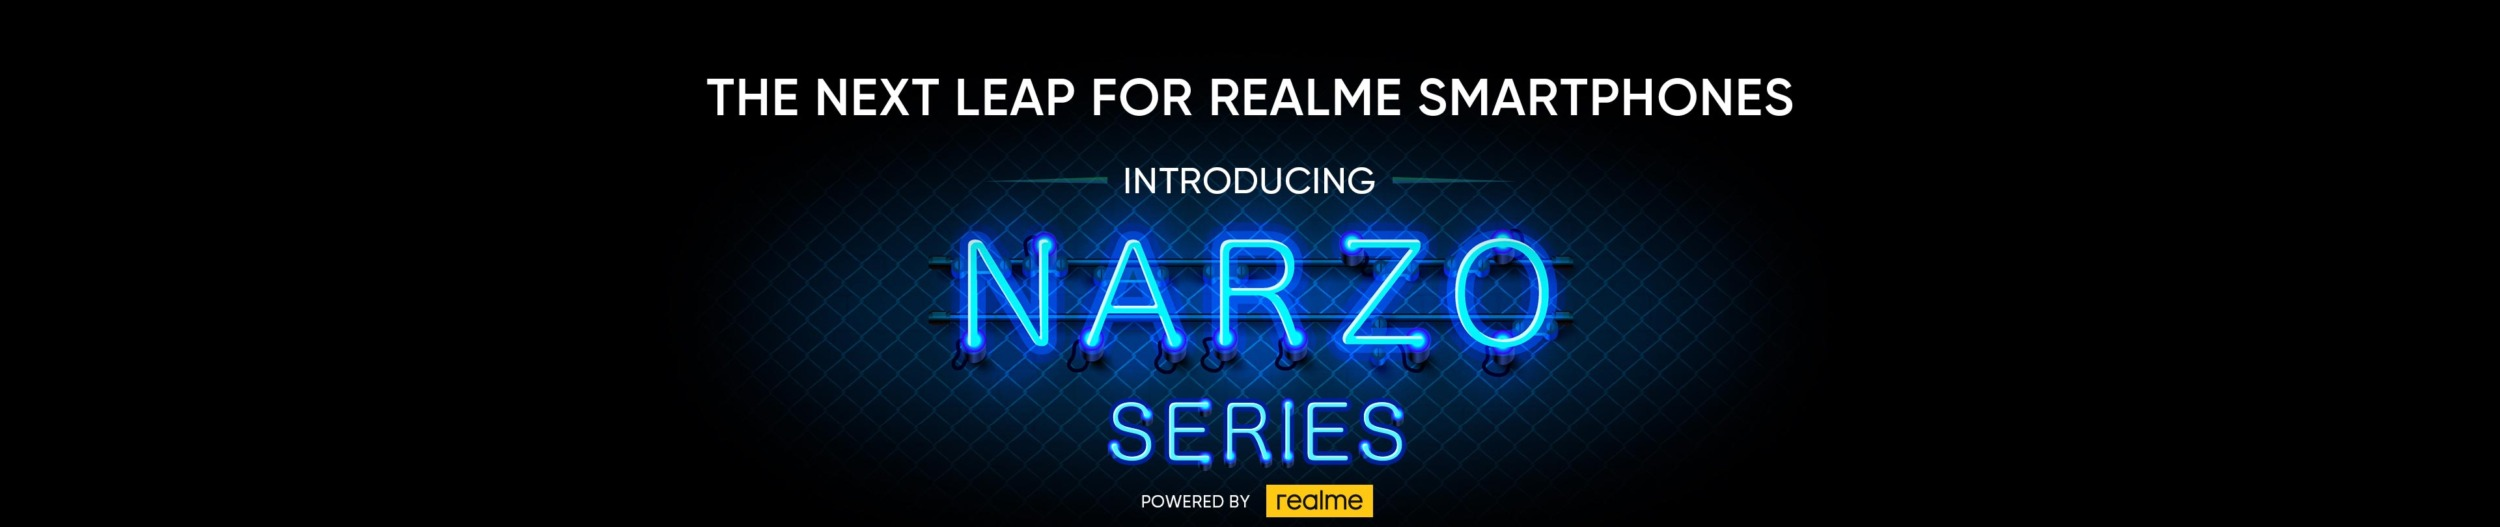 Realme Narzo 7 3840x810x